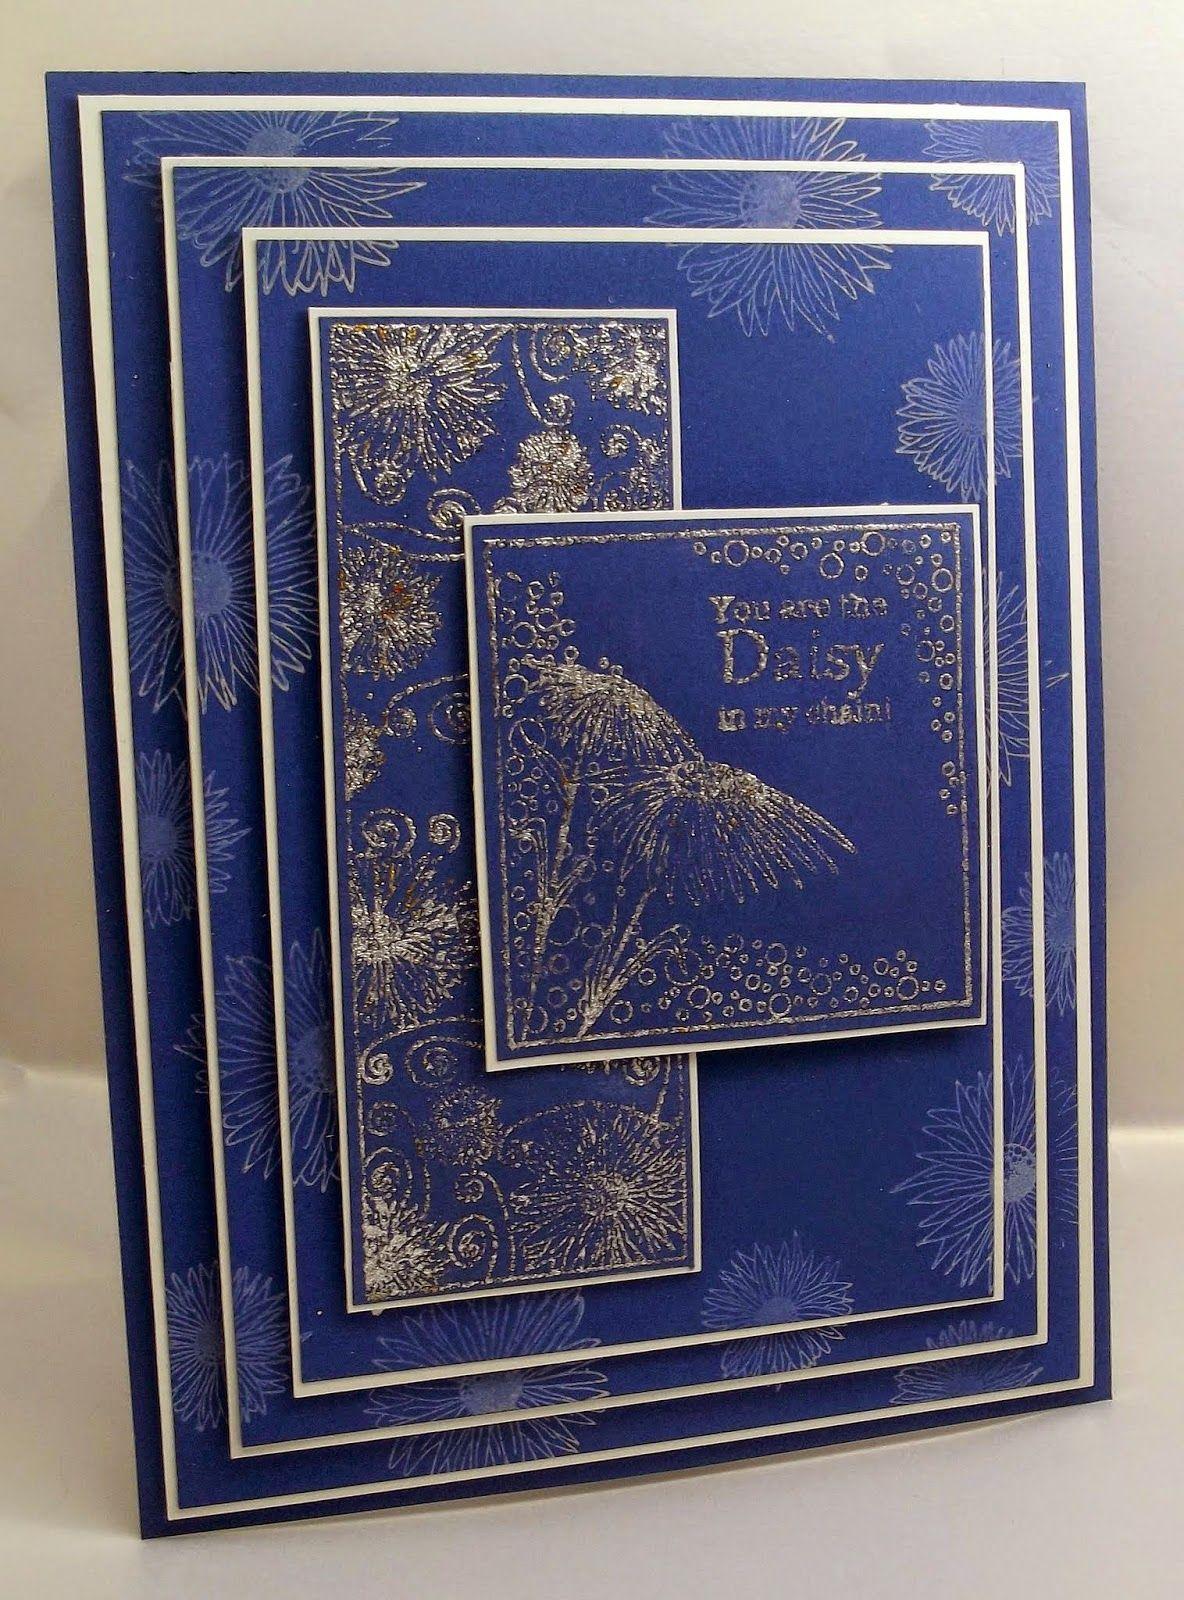 Next door & daisy card by John Lockwood | Cards I Love.... | Pinterest | Blog ... pezcame.com